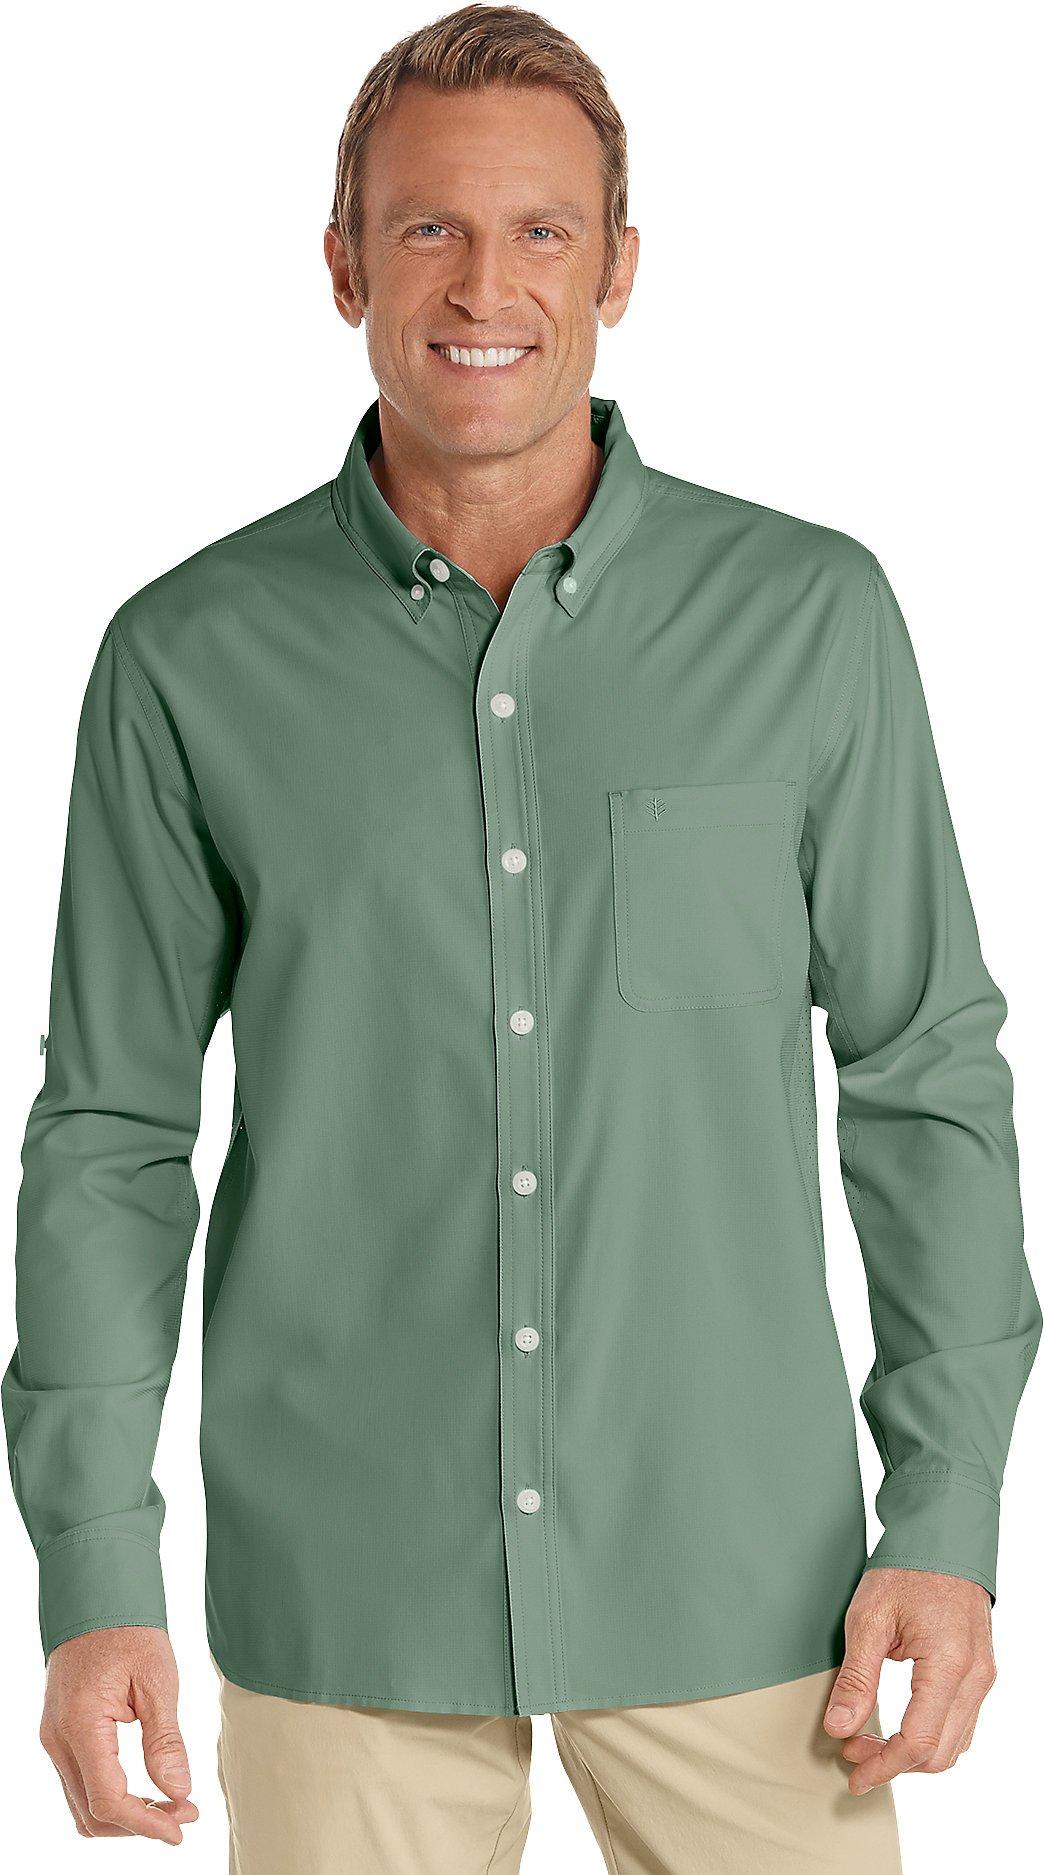 Coolibar UPF 50+ Men's Sun Shirt (X-Large- Olive)